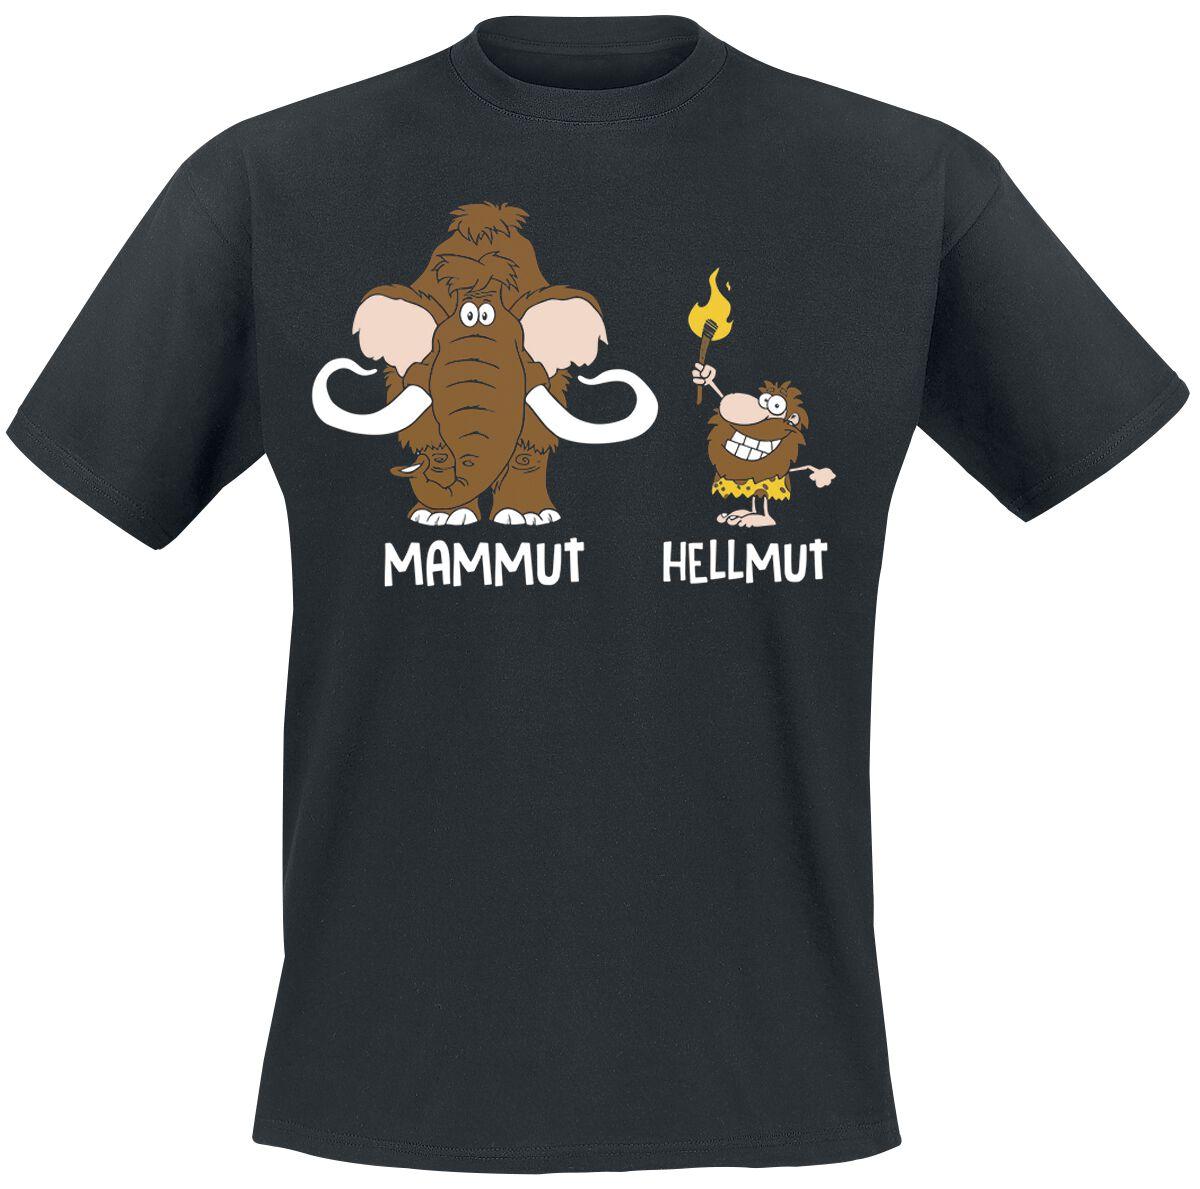 best service cd2e9 b28ae Mammut Helmut